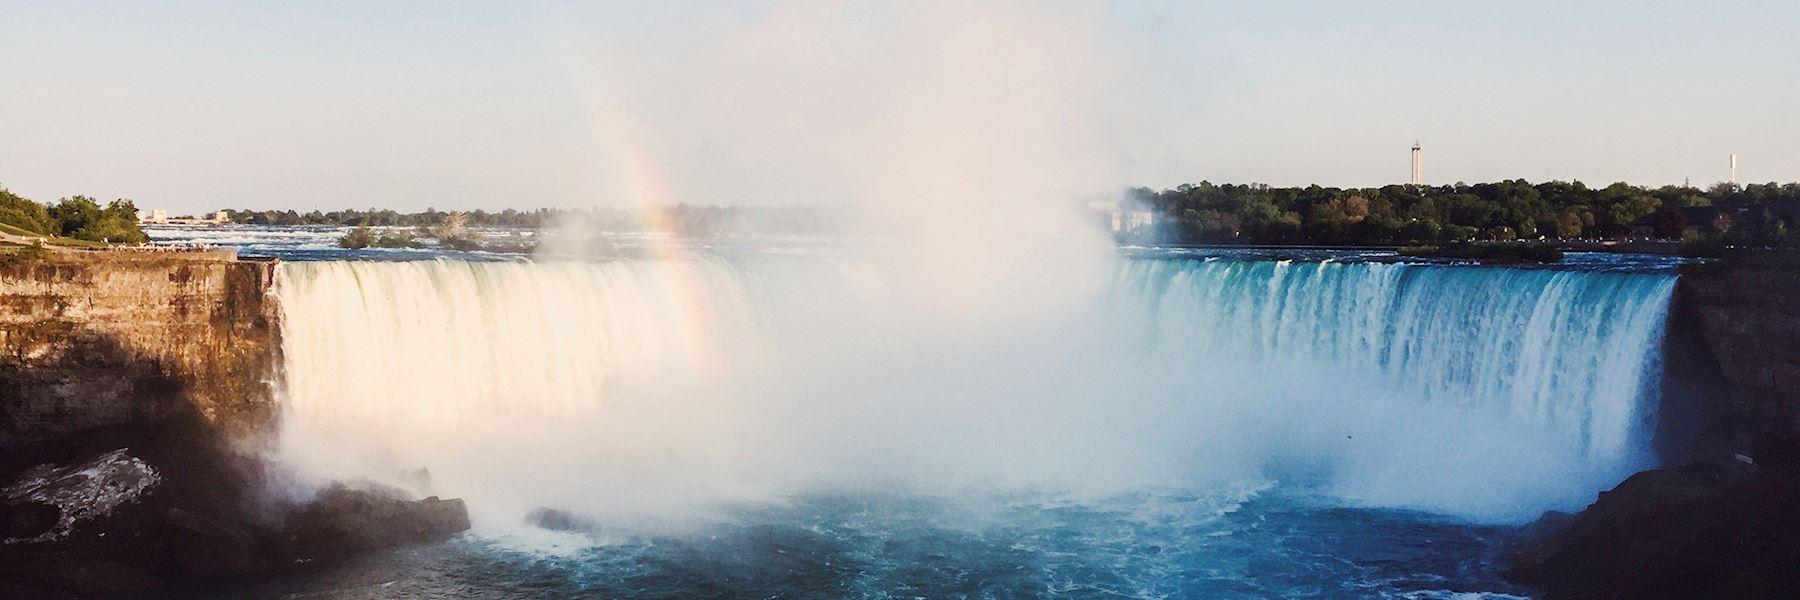 Visit Niagara Falls, Canada